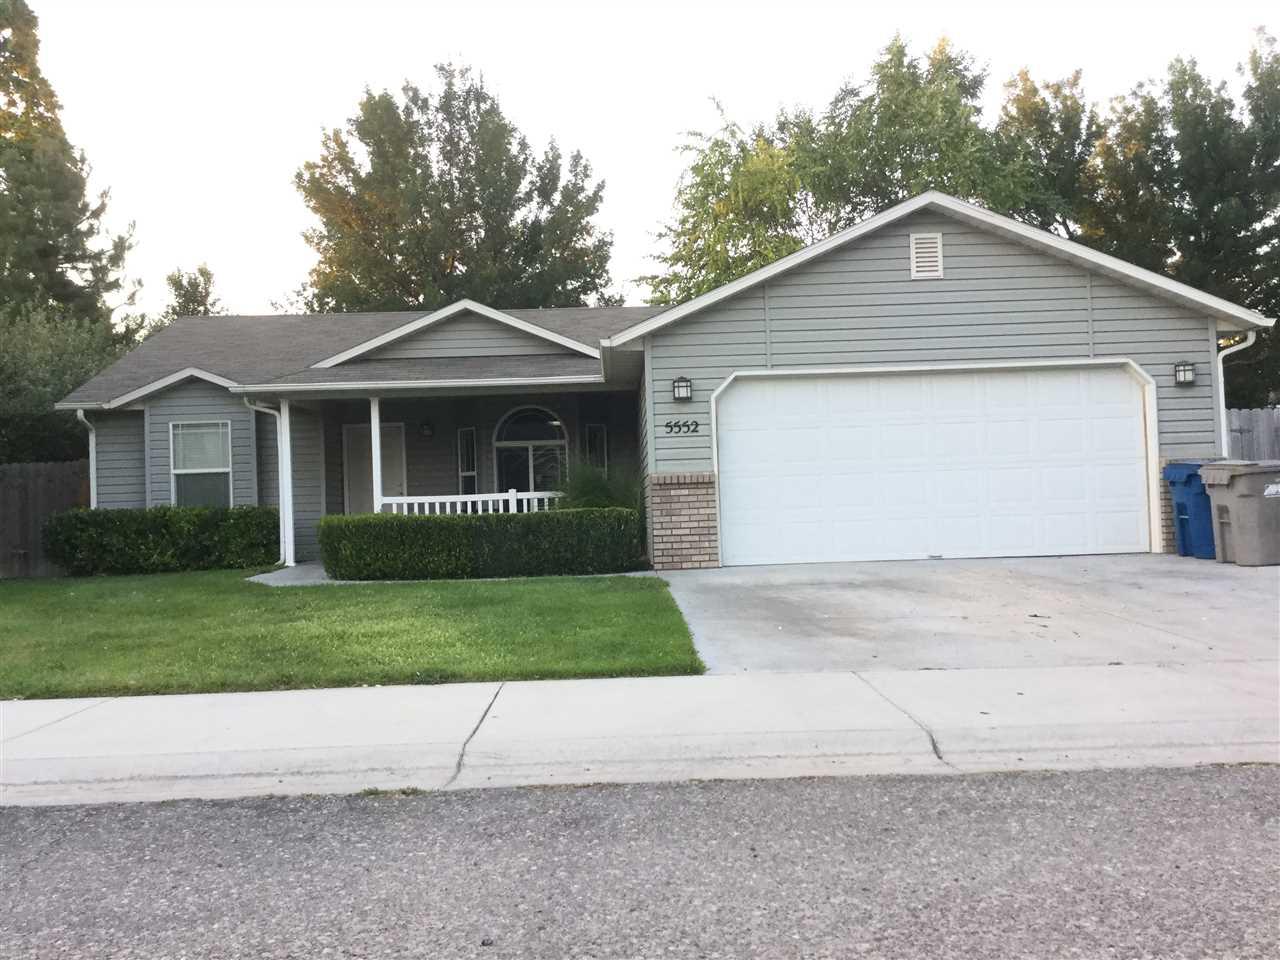 5552 W Chandra, Boise, ID 83705